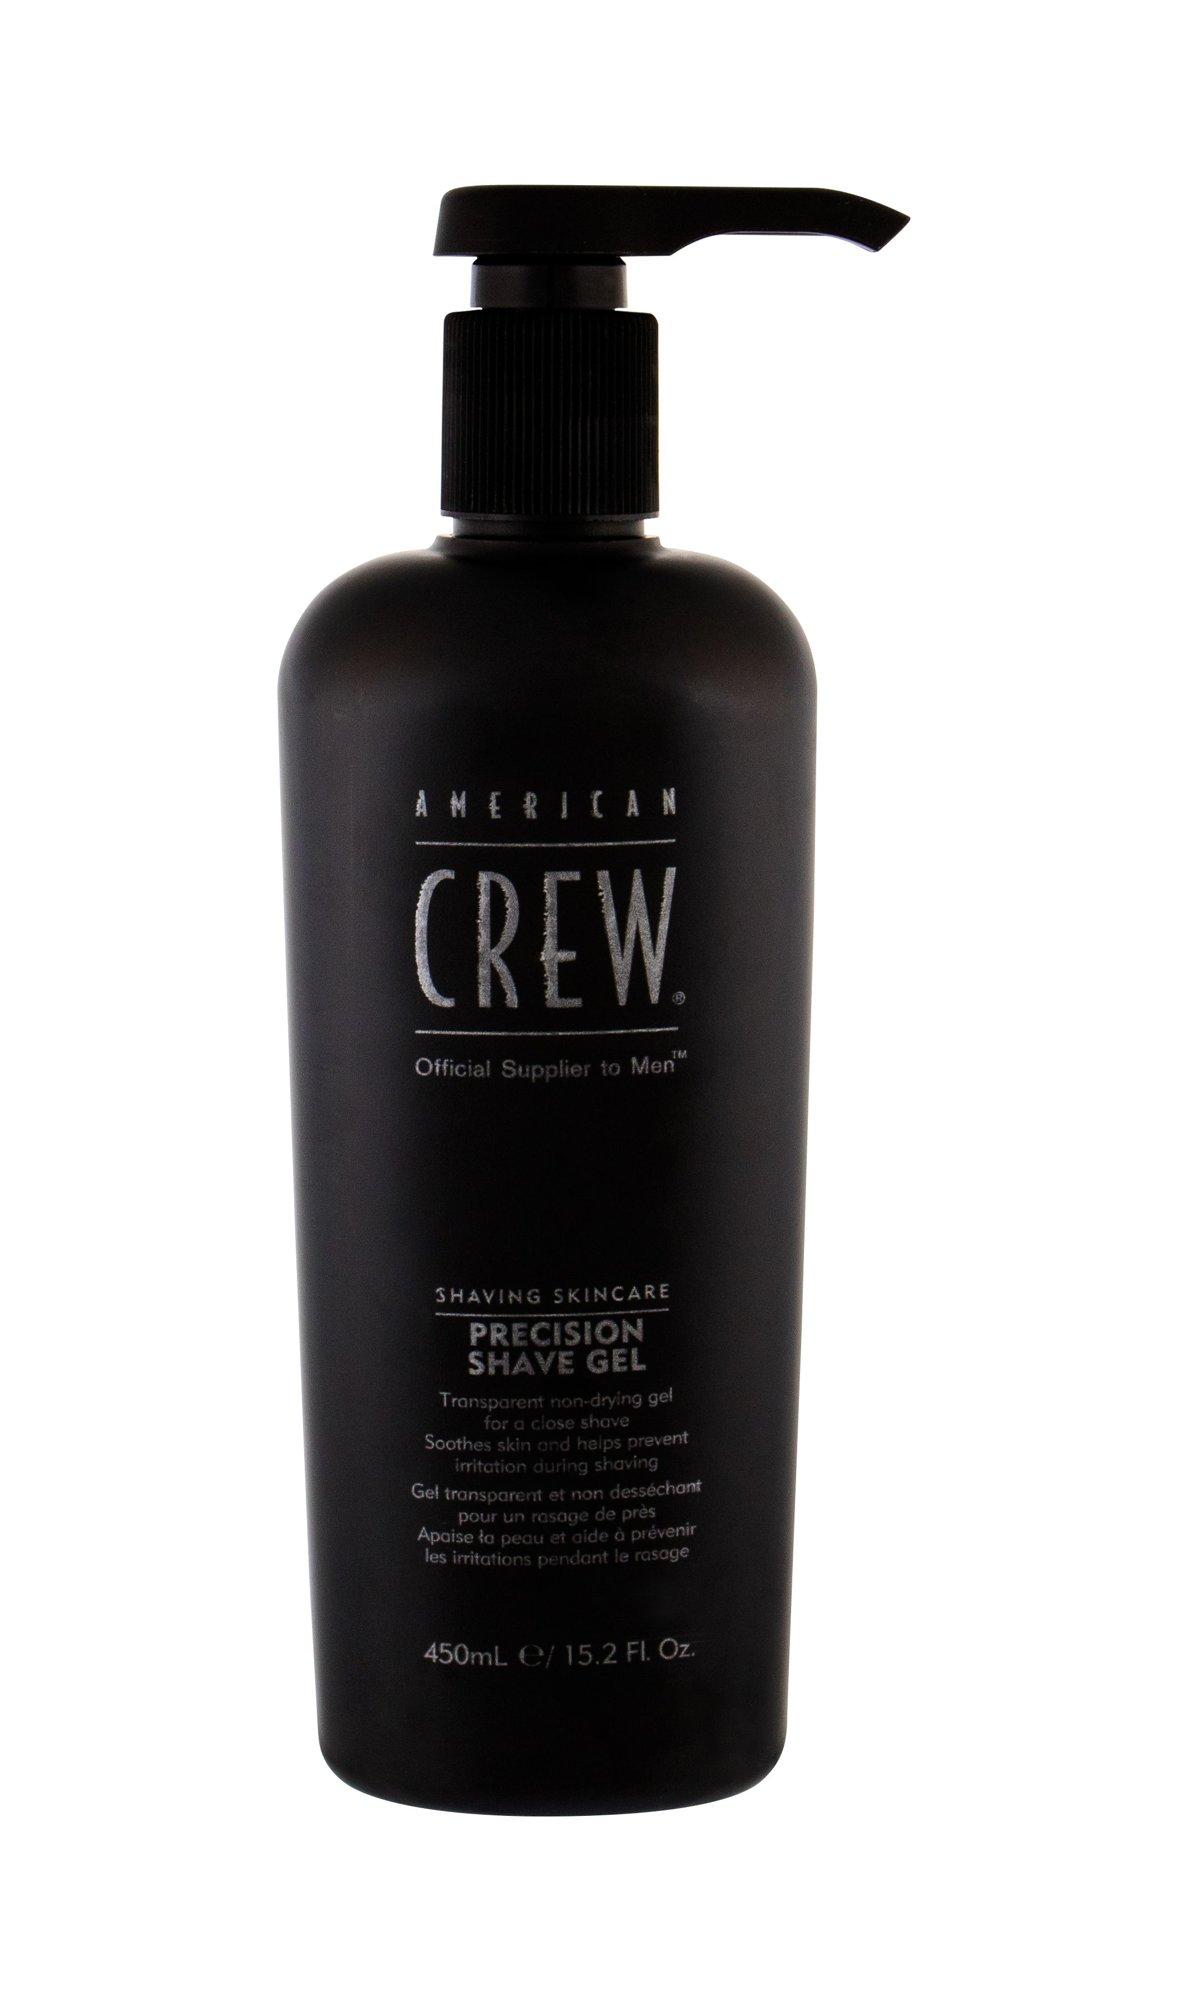 American Crew Shaving Skincare Shaving Gel 450ml  Precision Shave Gel